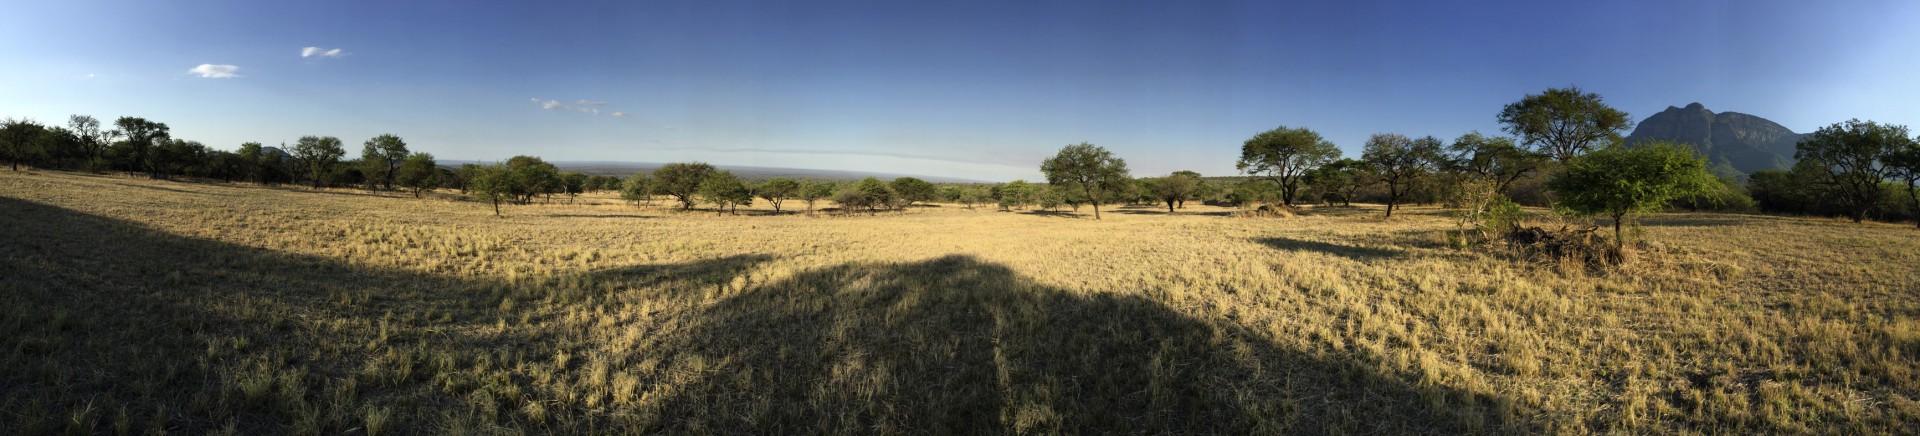 Südafrika15_0600